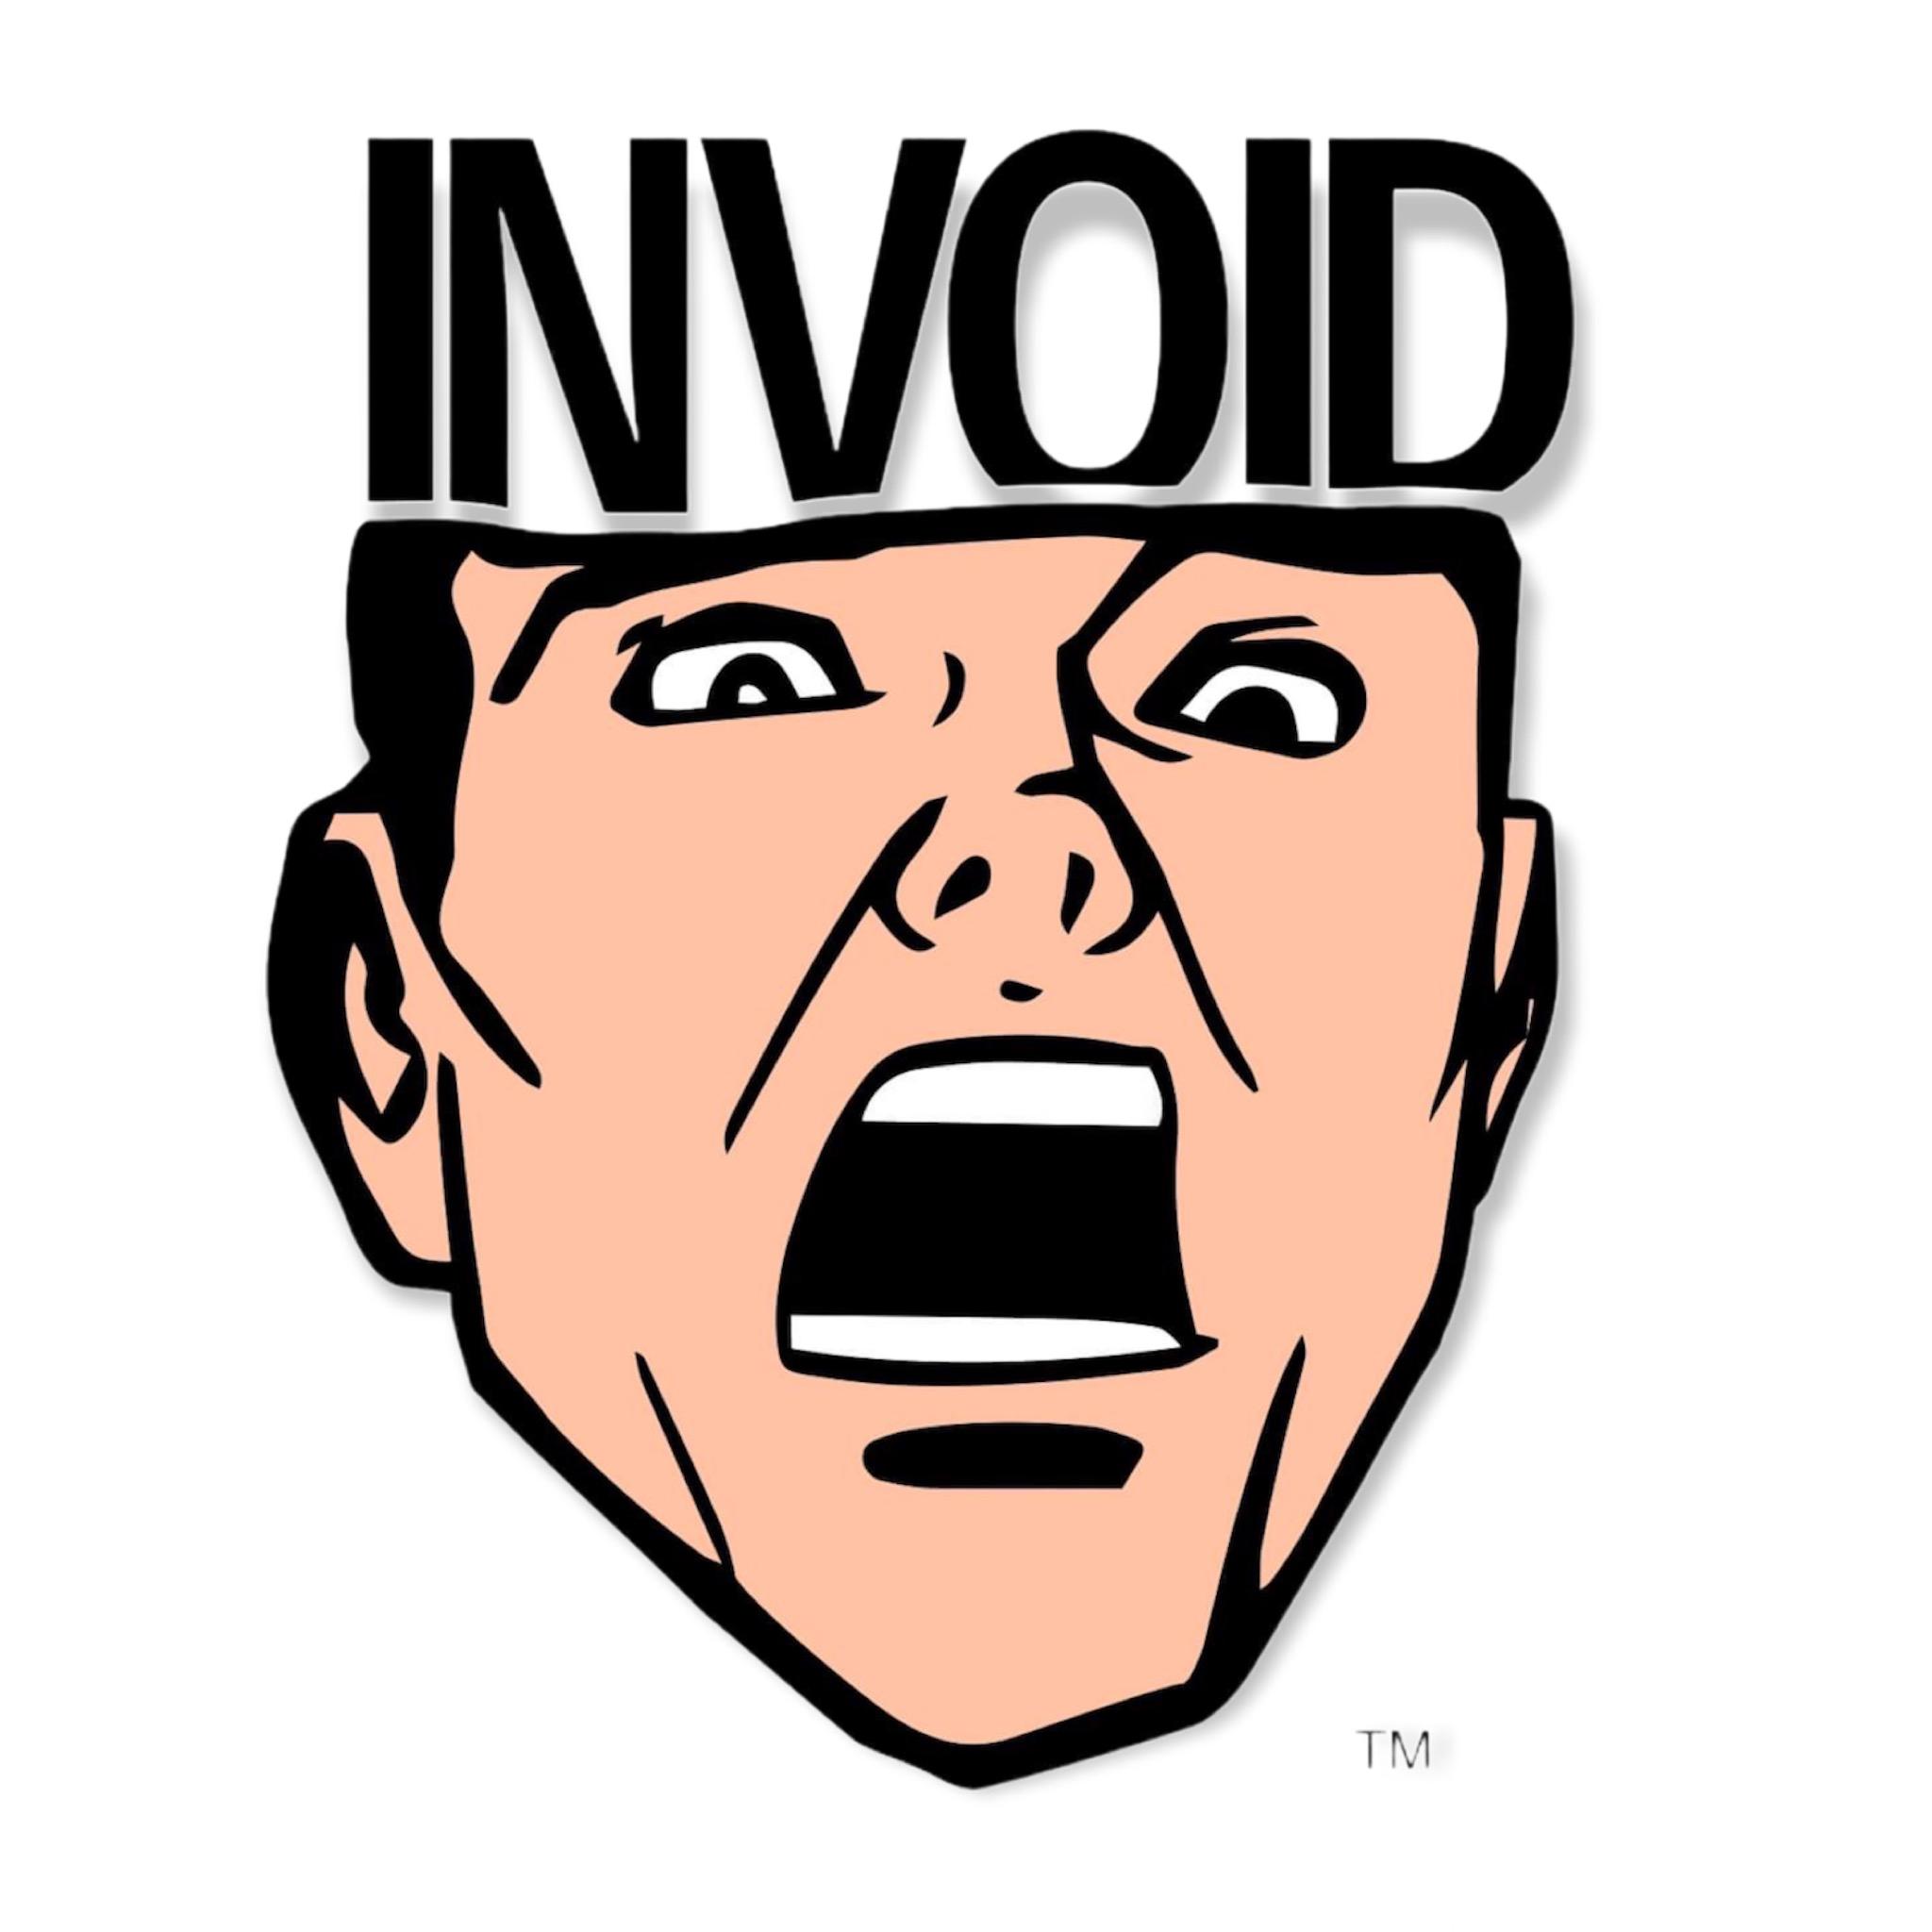 invoid name